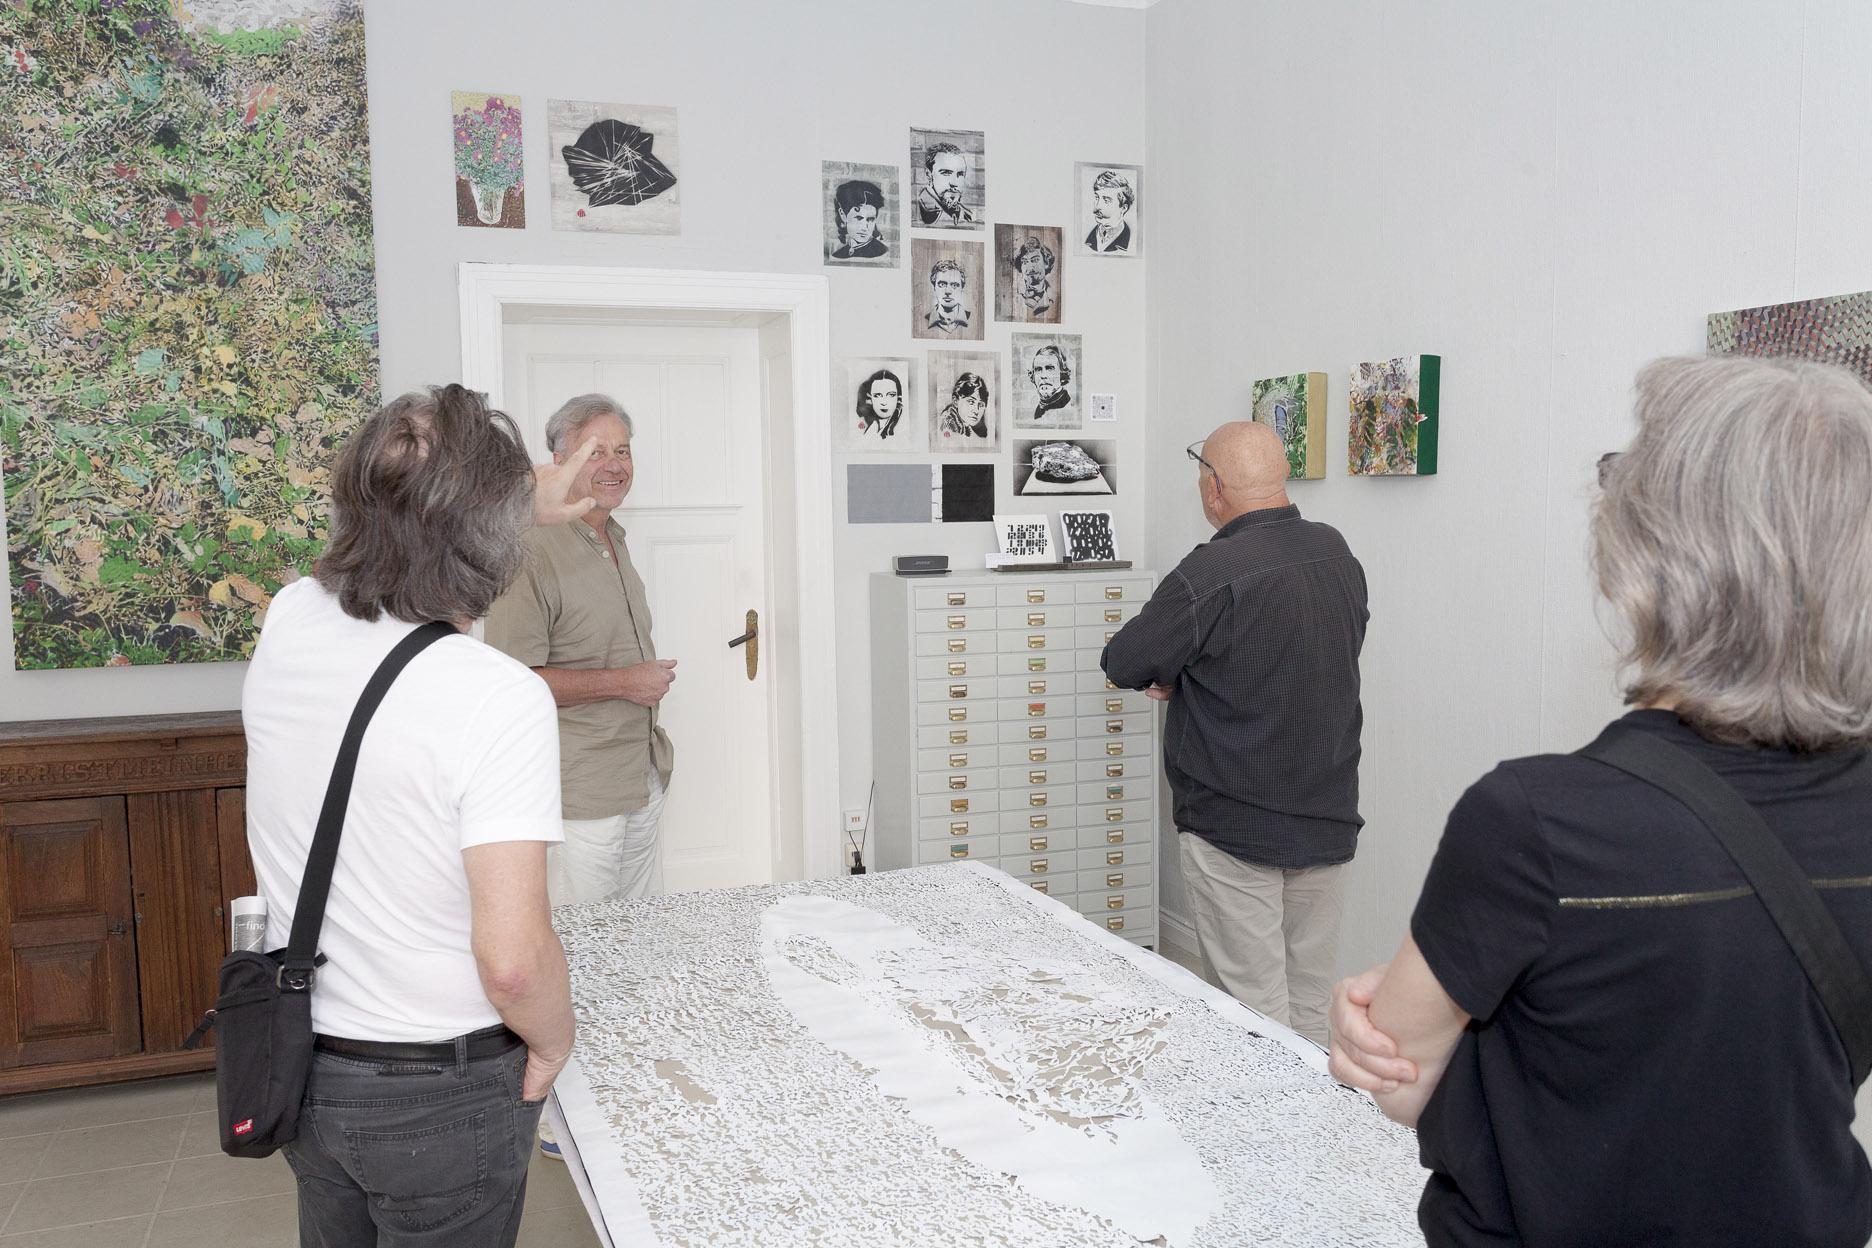 Atelierspaziergang am 14.08.2021, mit Dr. Peter Funken, Atelier Mahlow